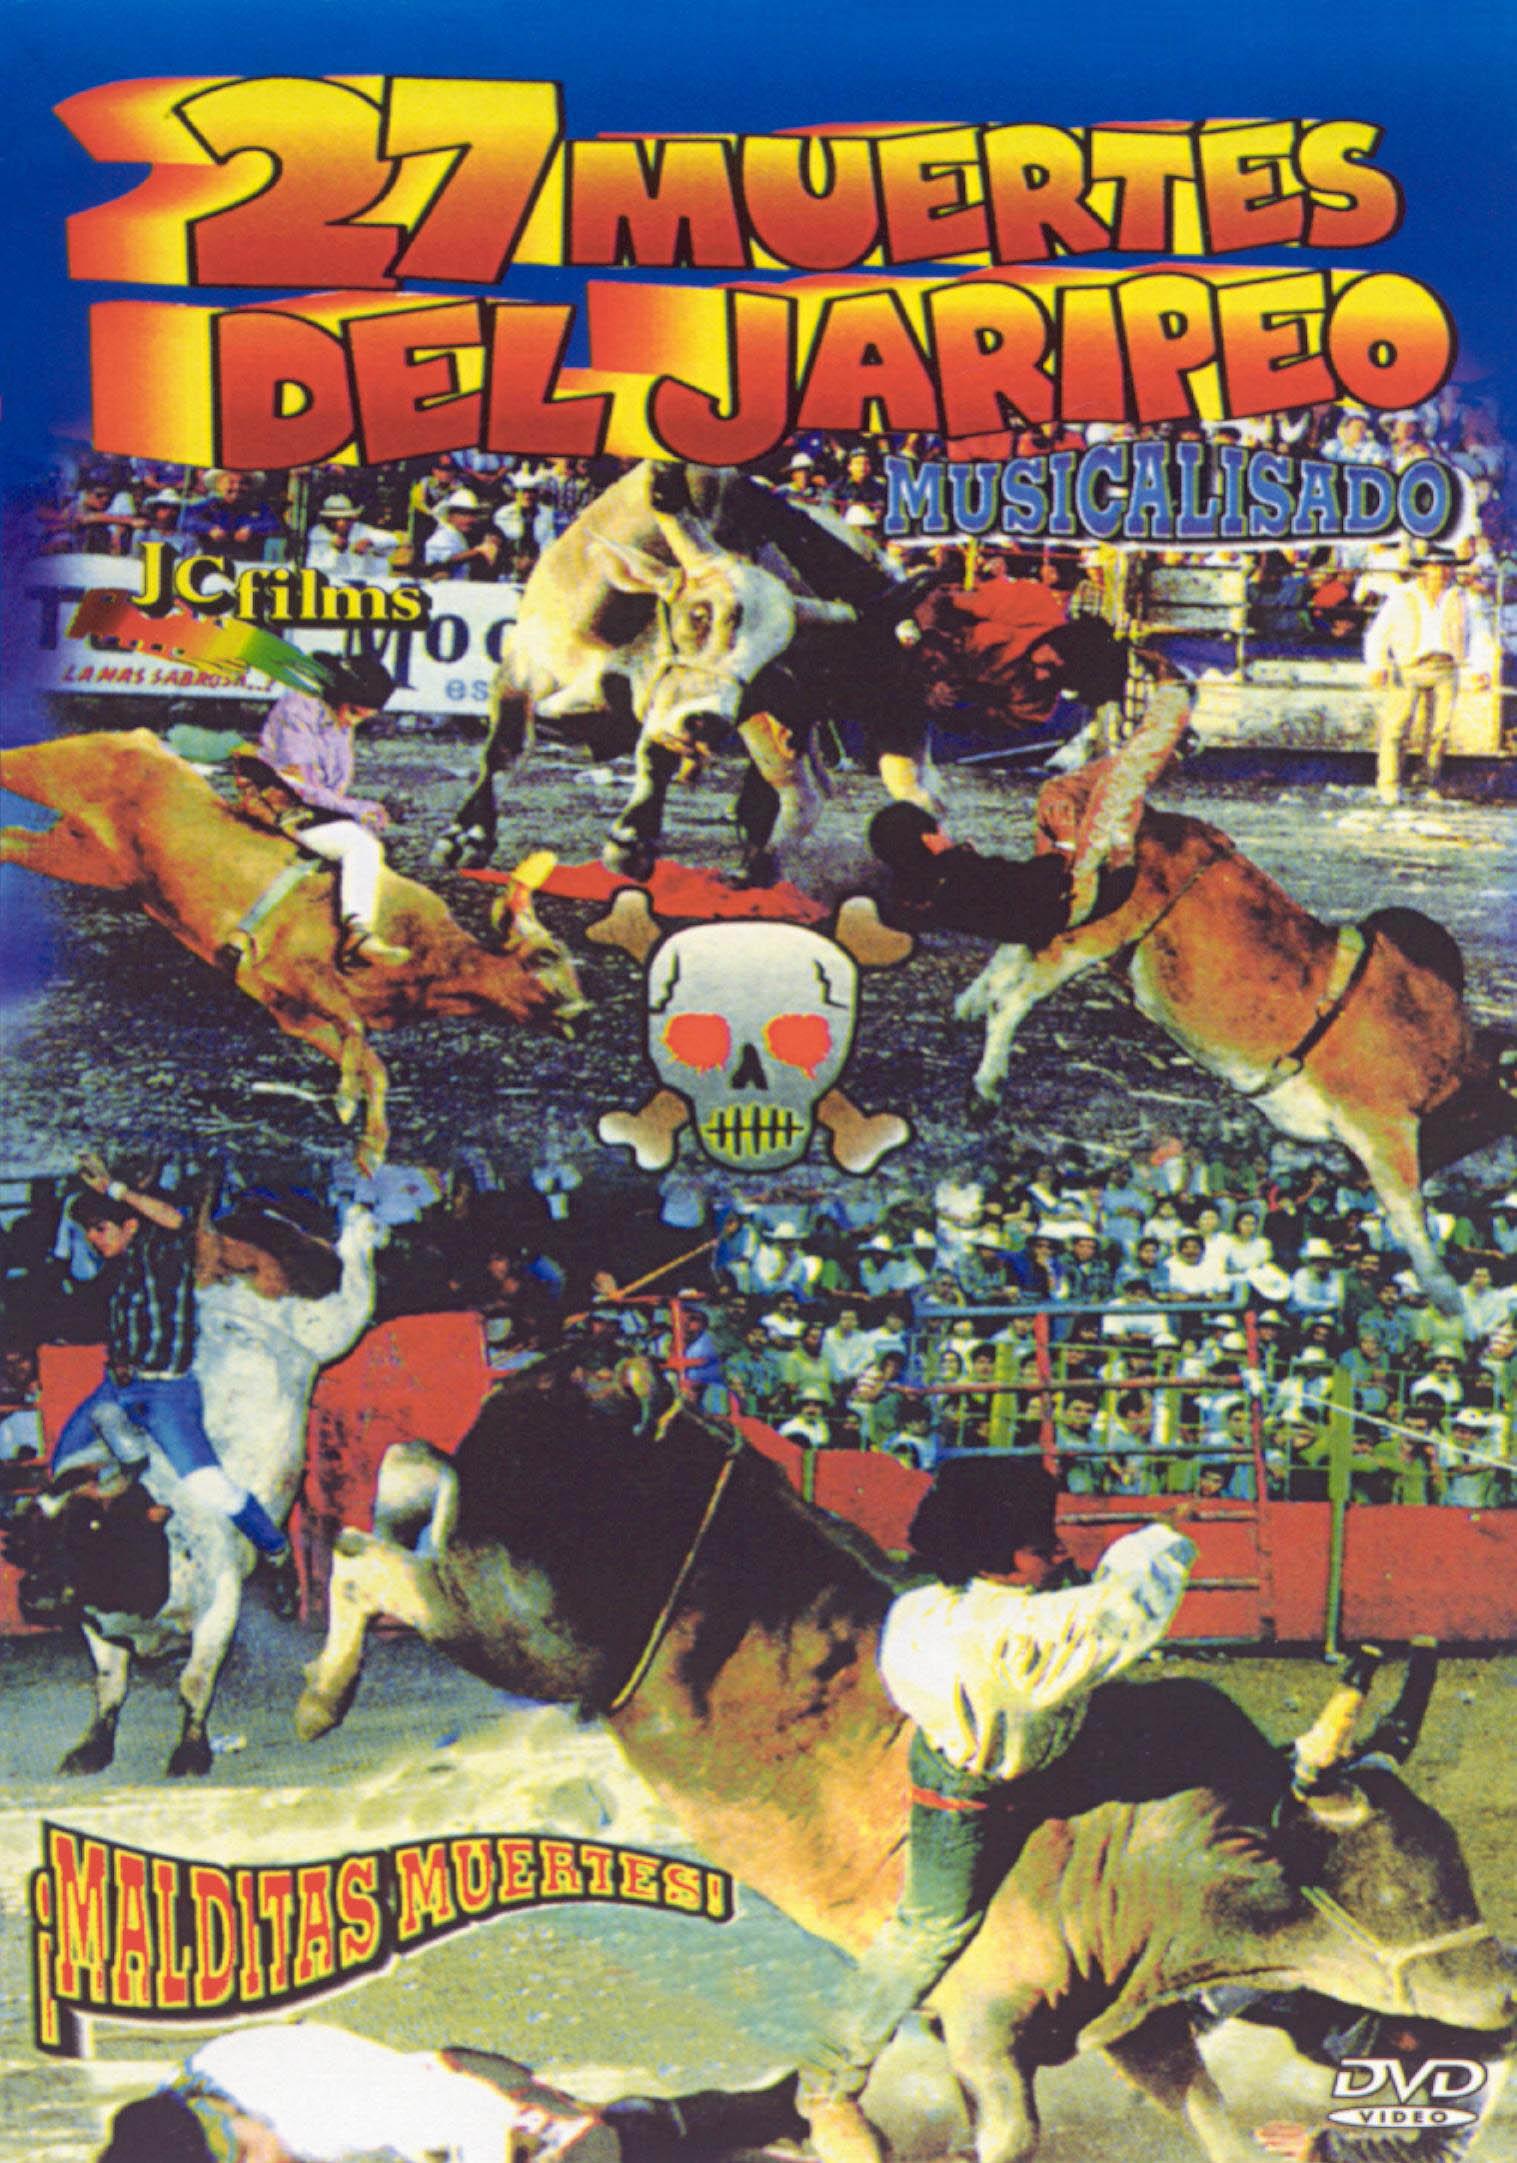 27 Muertes del Jaripeo